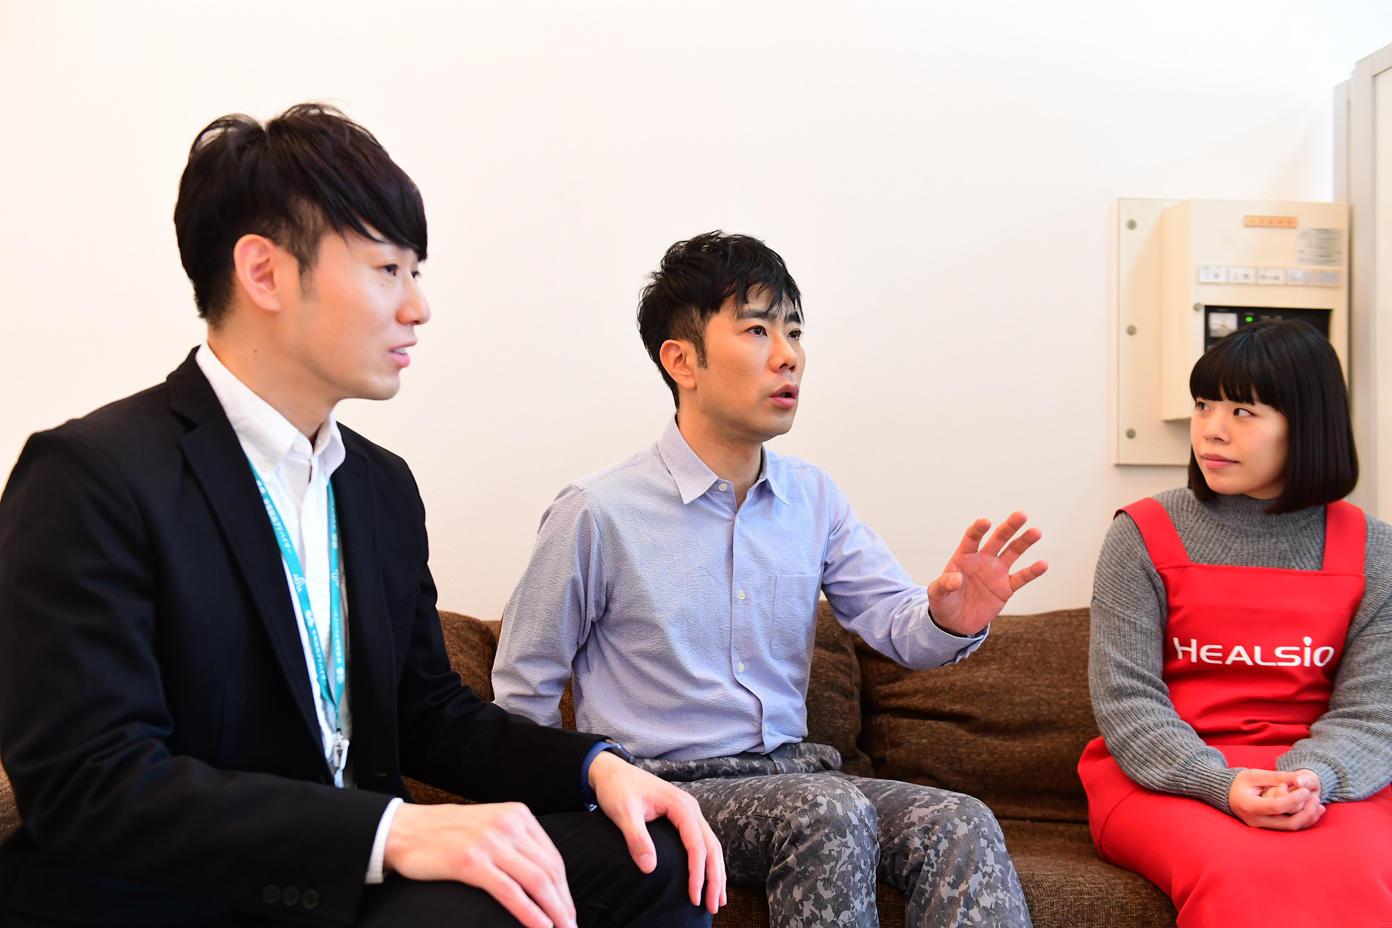 http://news.yoshimoto.co.jp/20170414144015-4fcdb4d1e3c2d1187bd54fd2defa1d0efe840406.jpg